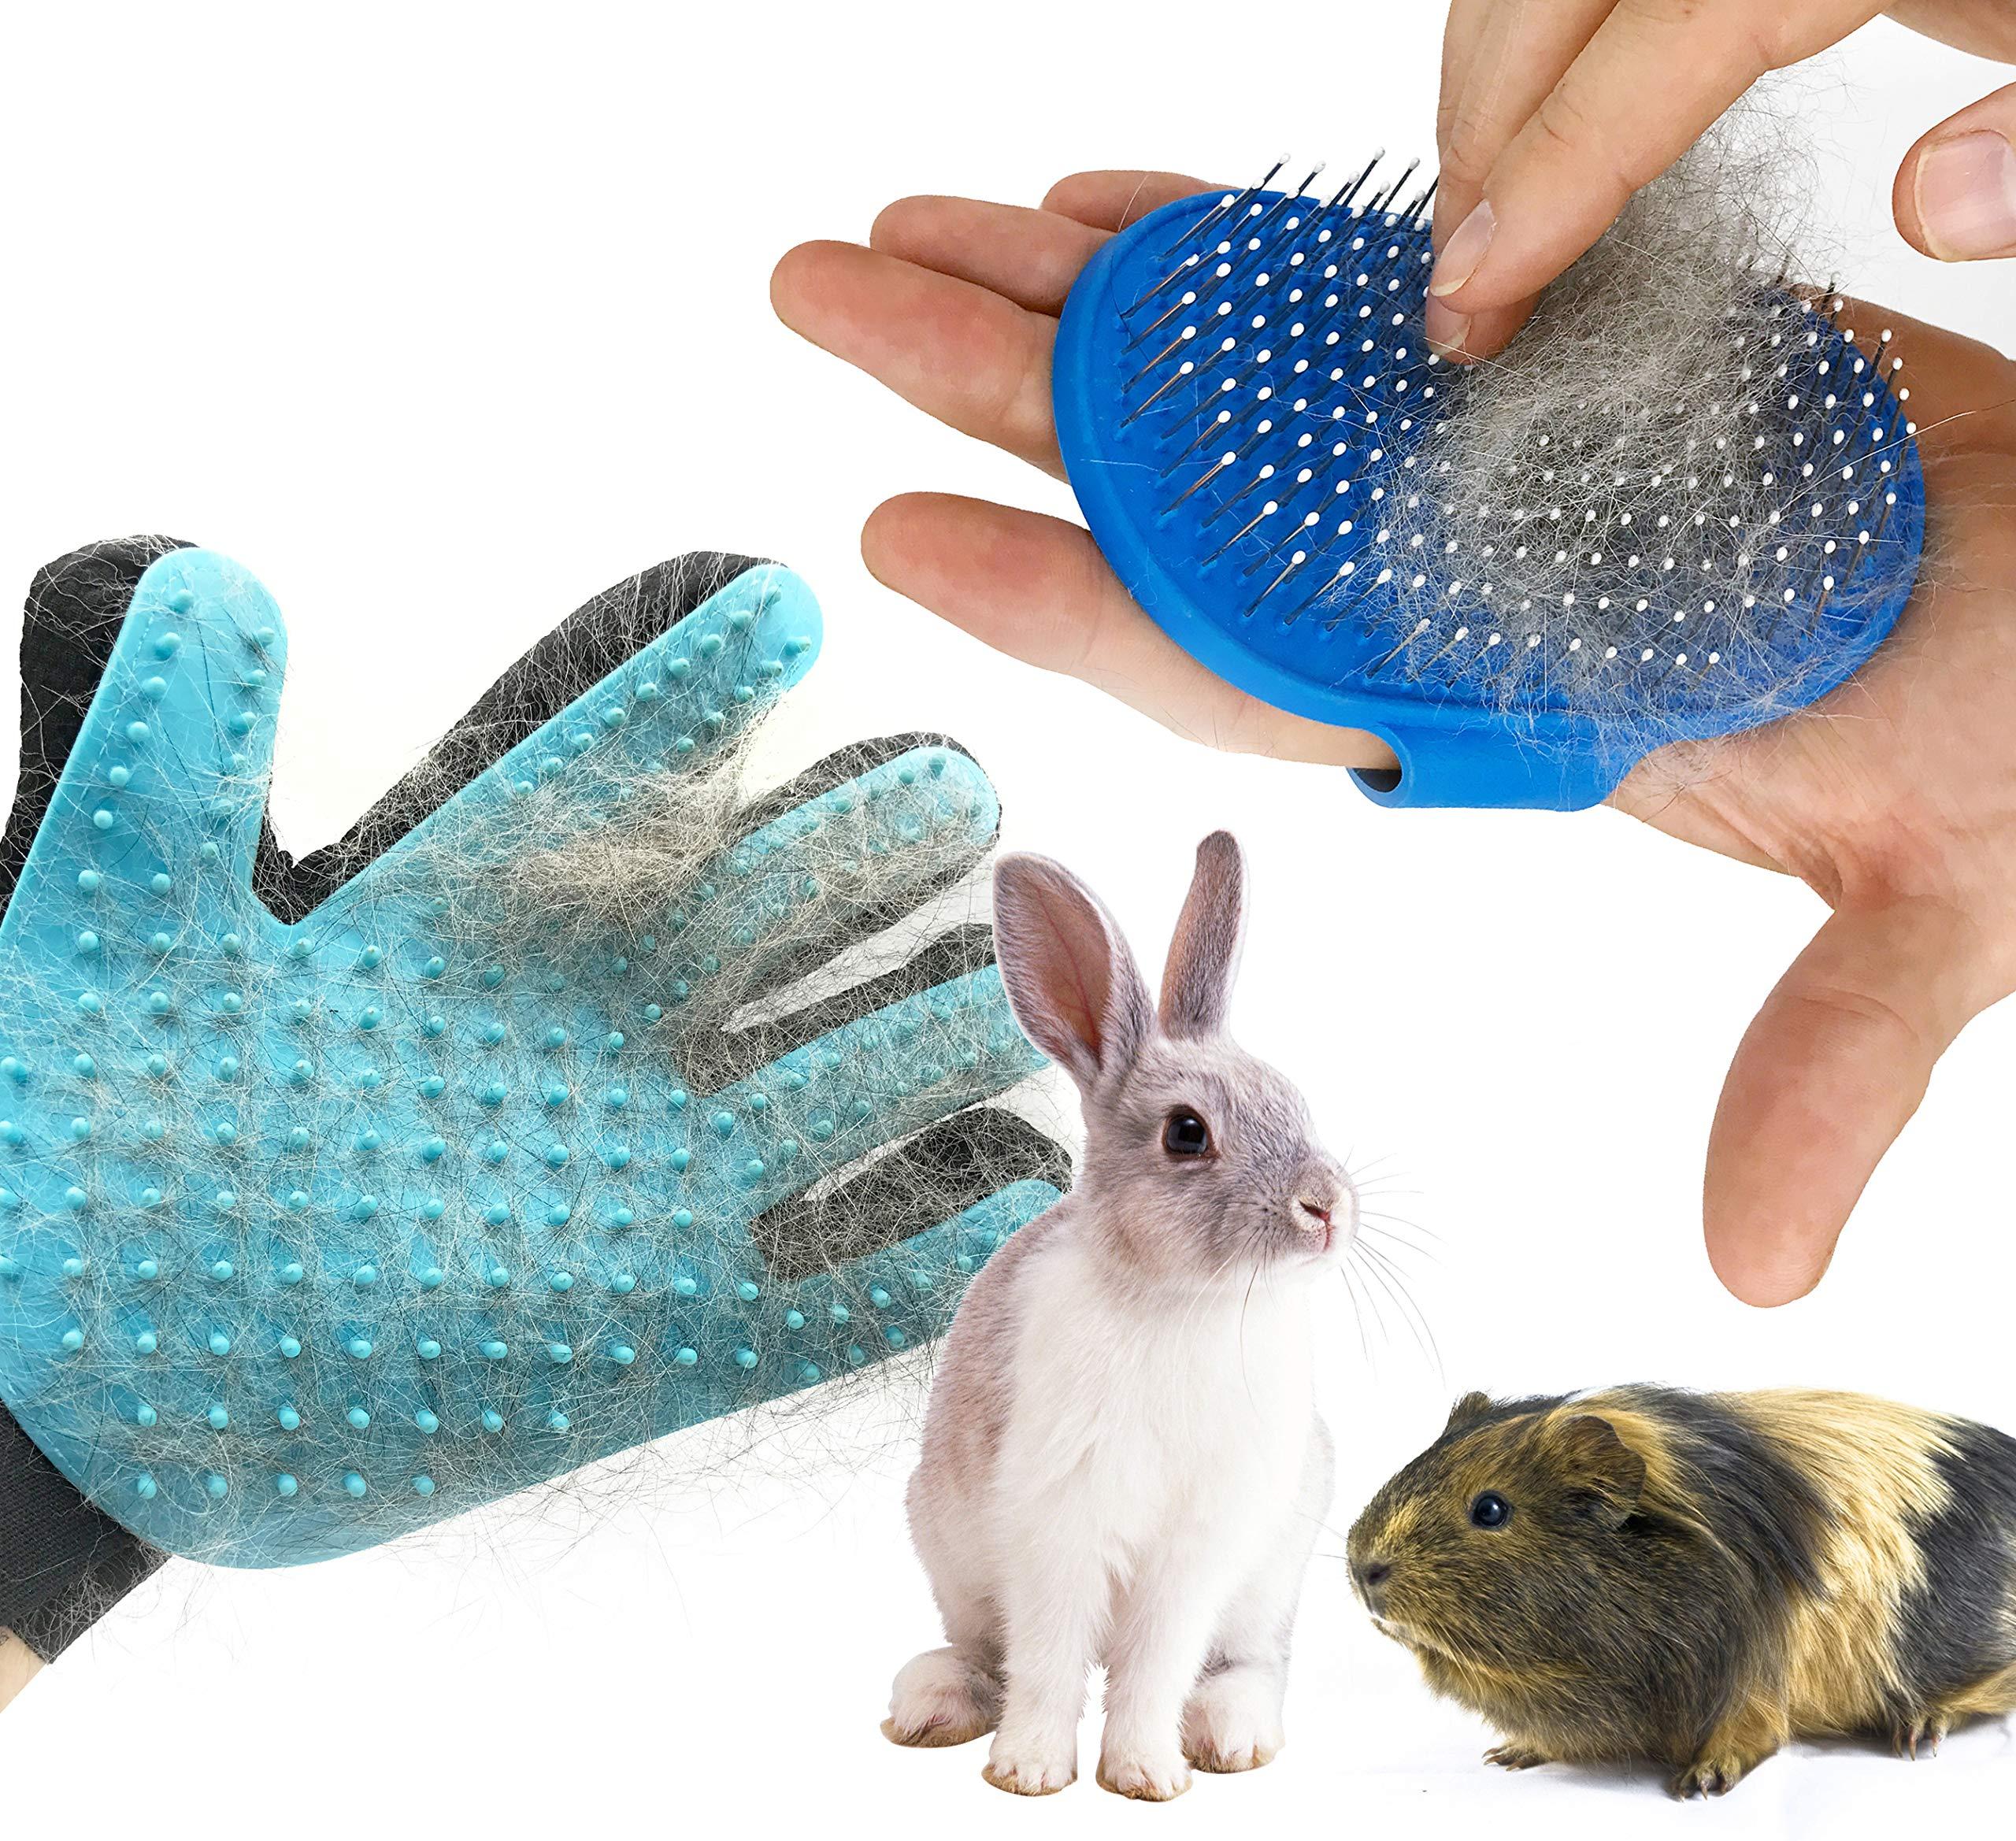 Dasksha Rabbit Grooming Kit with Rabbit Grooming Brush The Best Rabbit Hair Brush and Rabbit Hair Remover